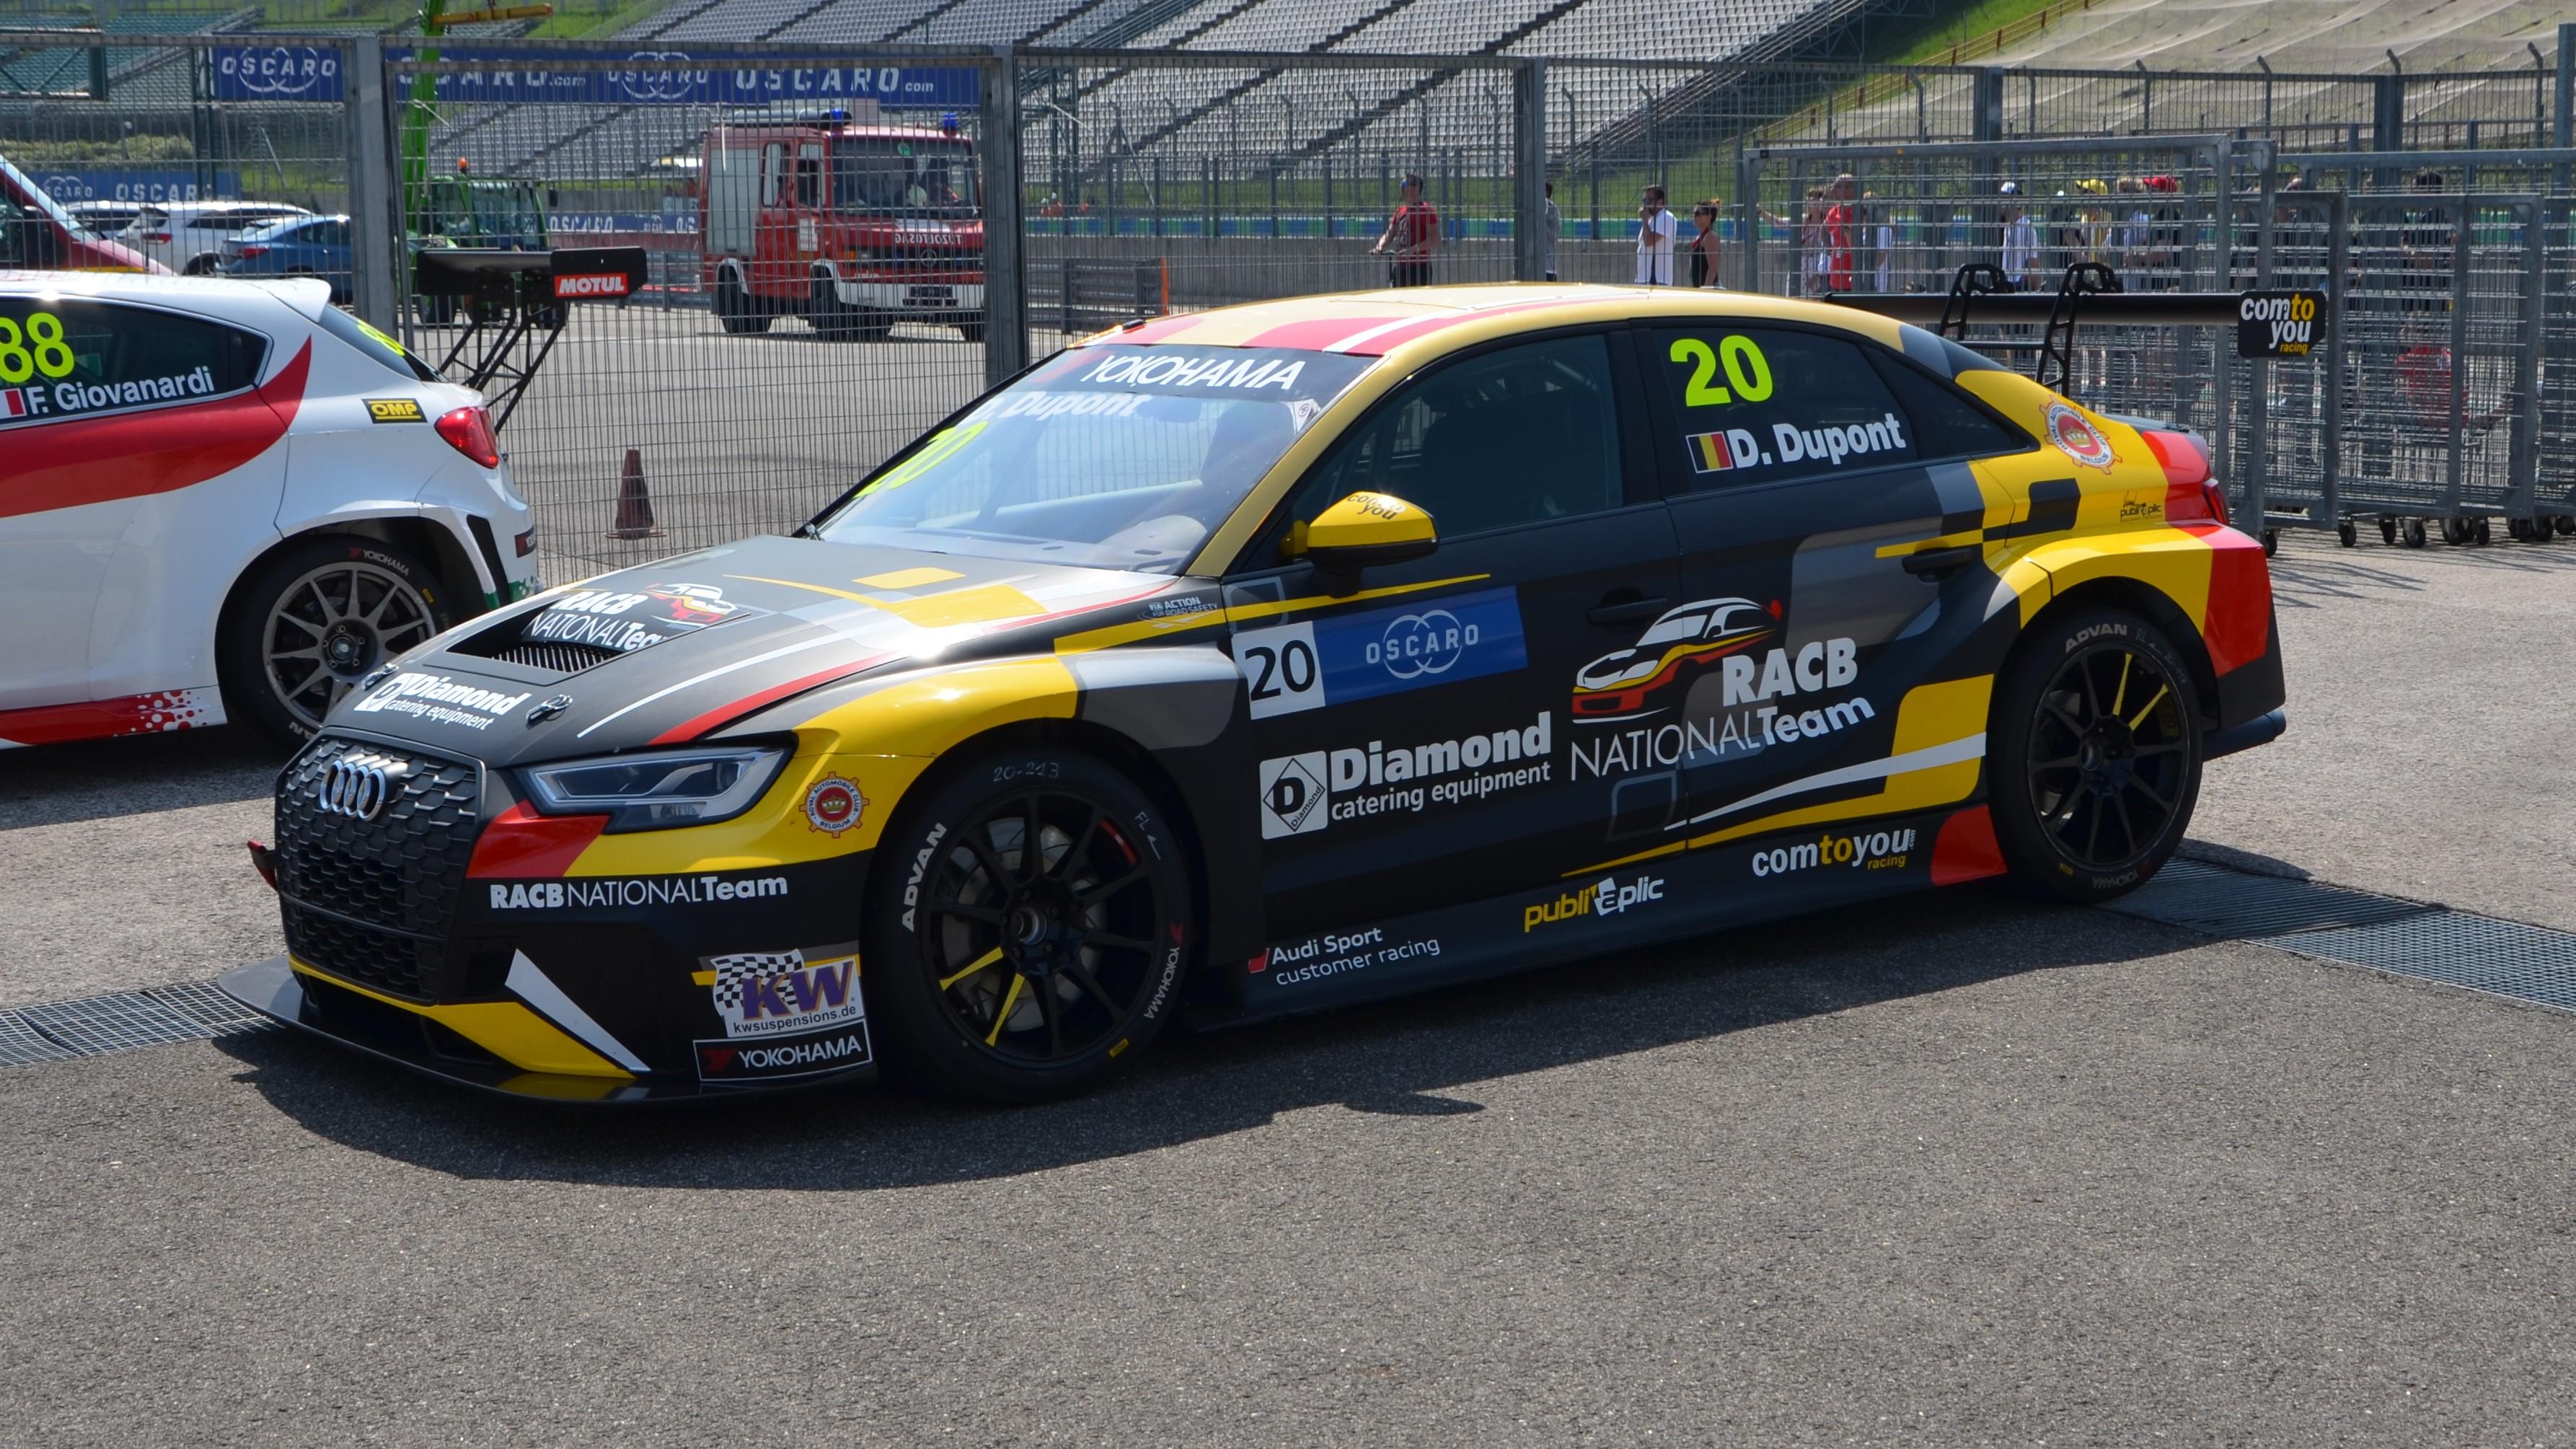 Wallpaper : WTCR, Audi RS3, race cars, FIA World Touring Car